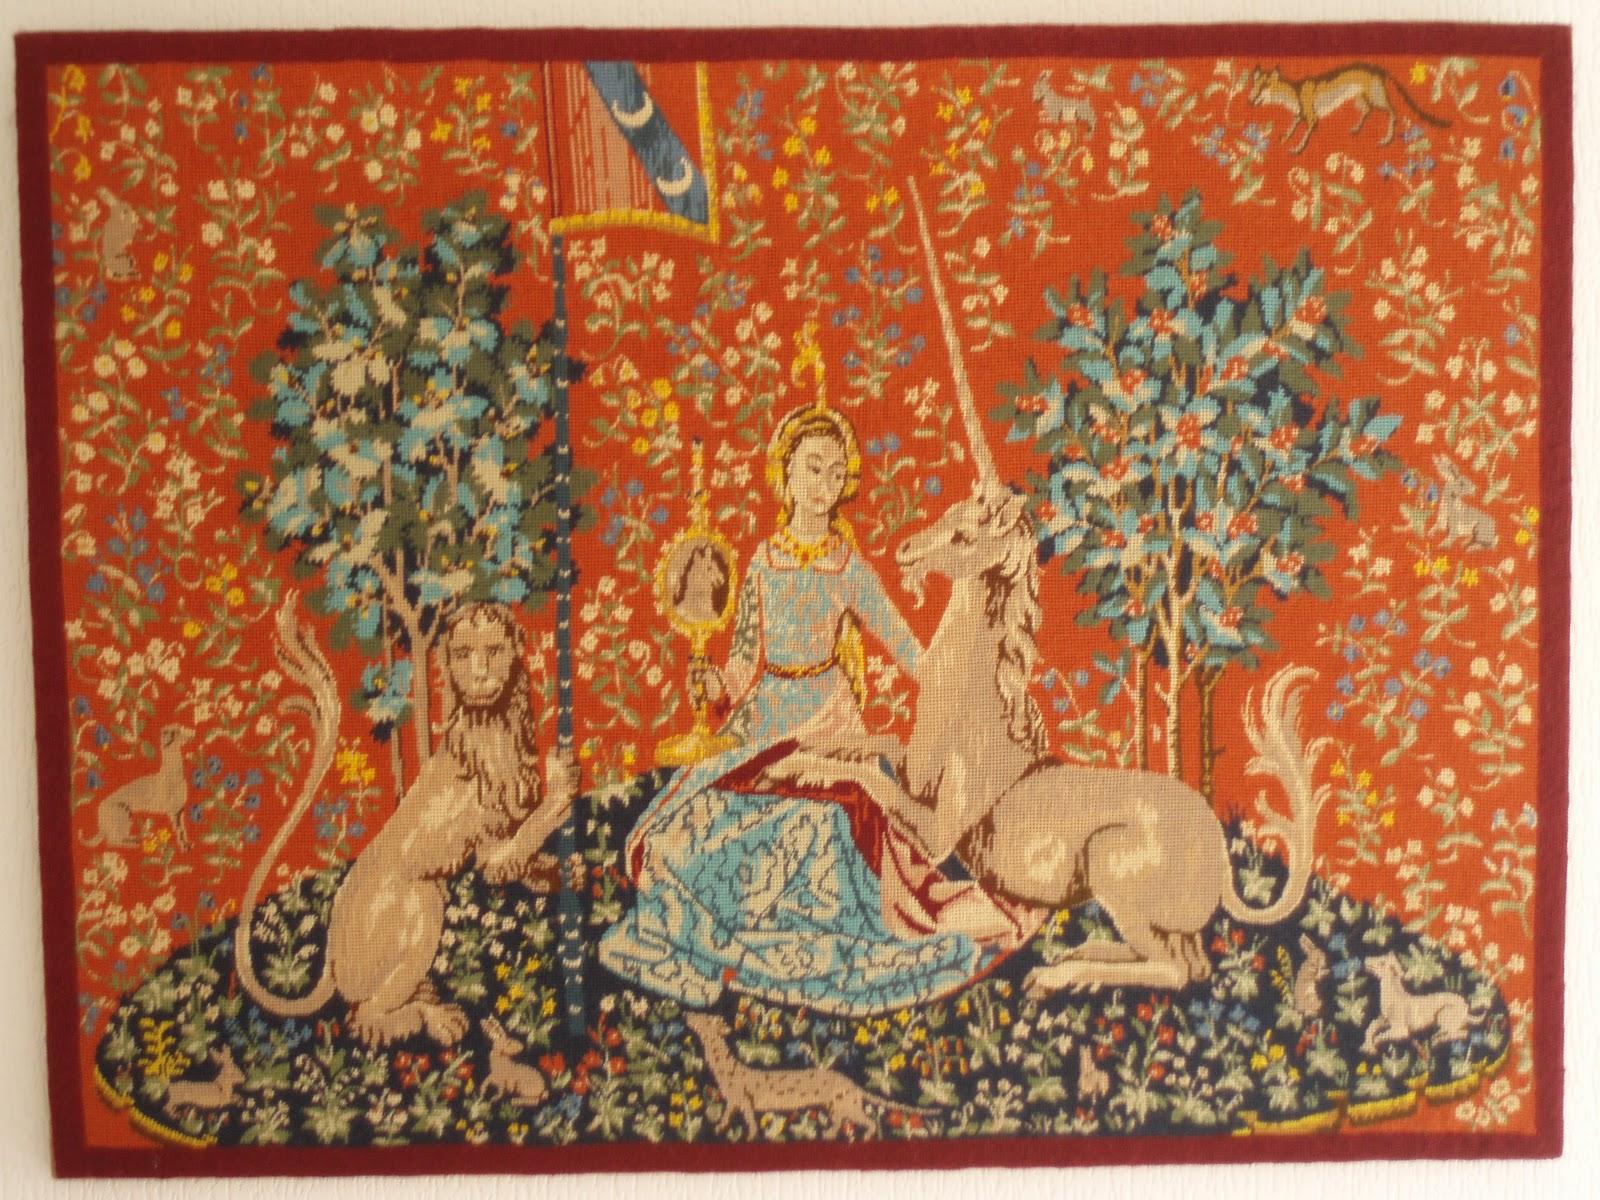 Dans un monde o r gnerait l 39 harmonie licorne de l gende - Tapisserie dame a la licorne ...